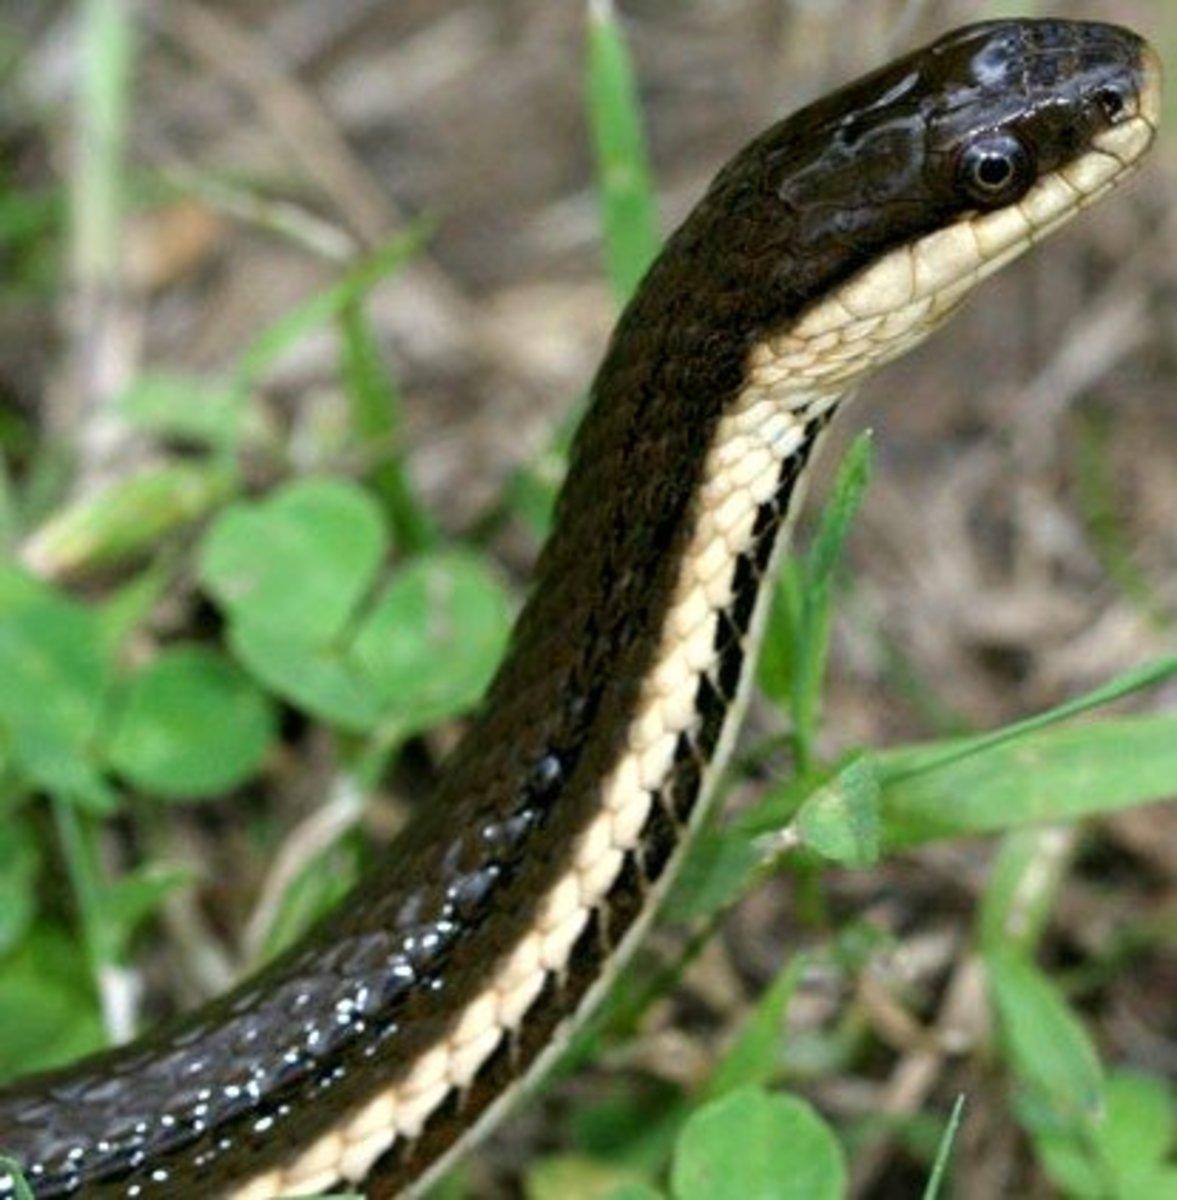 Queen Snake (Regina septemvittata) found everywhere in Indiana but the southwestern corner.